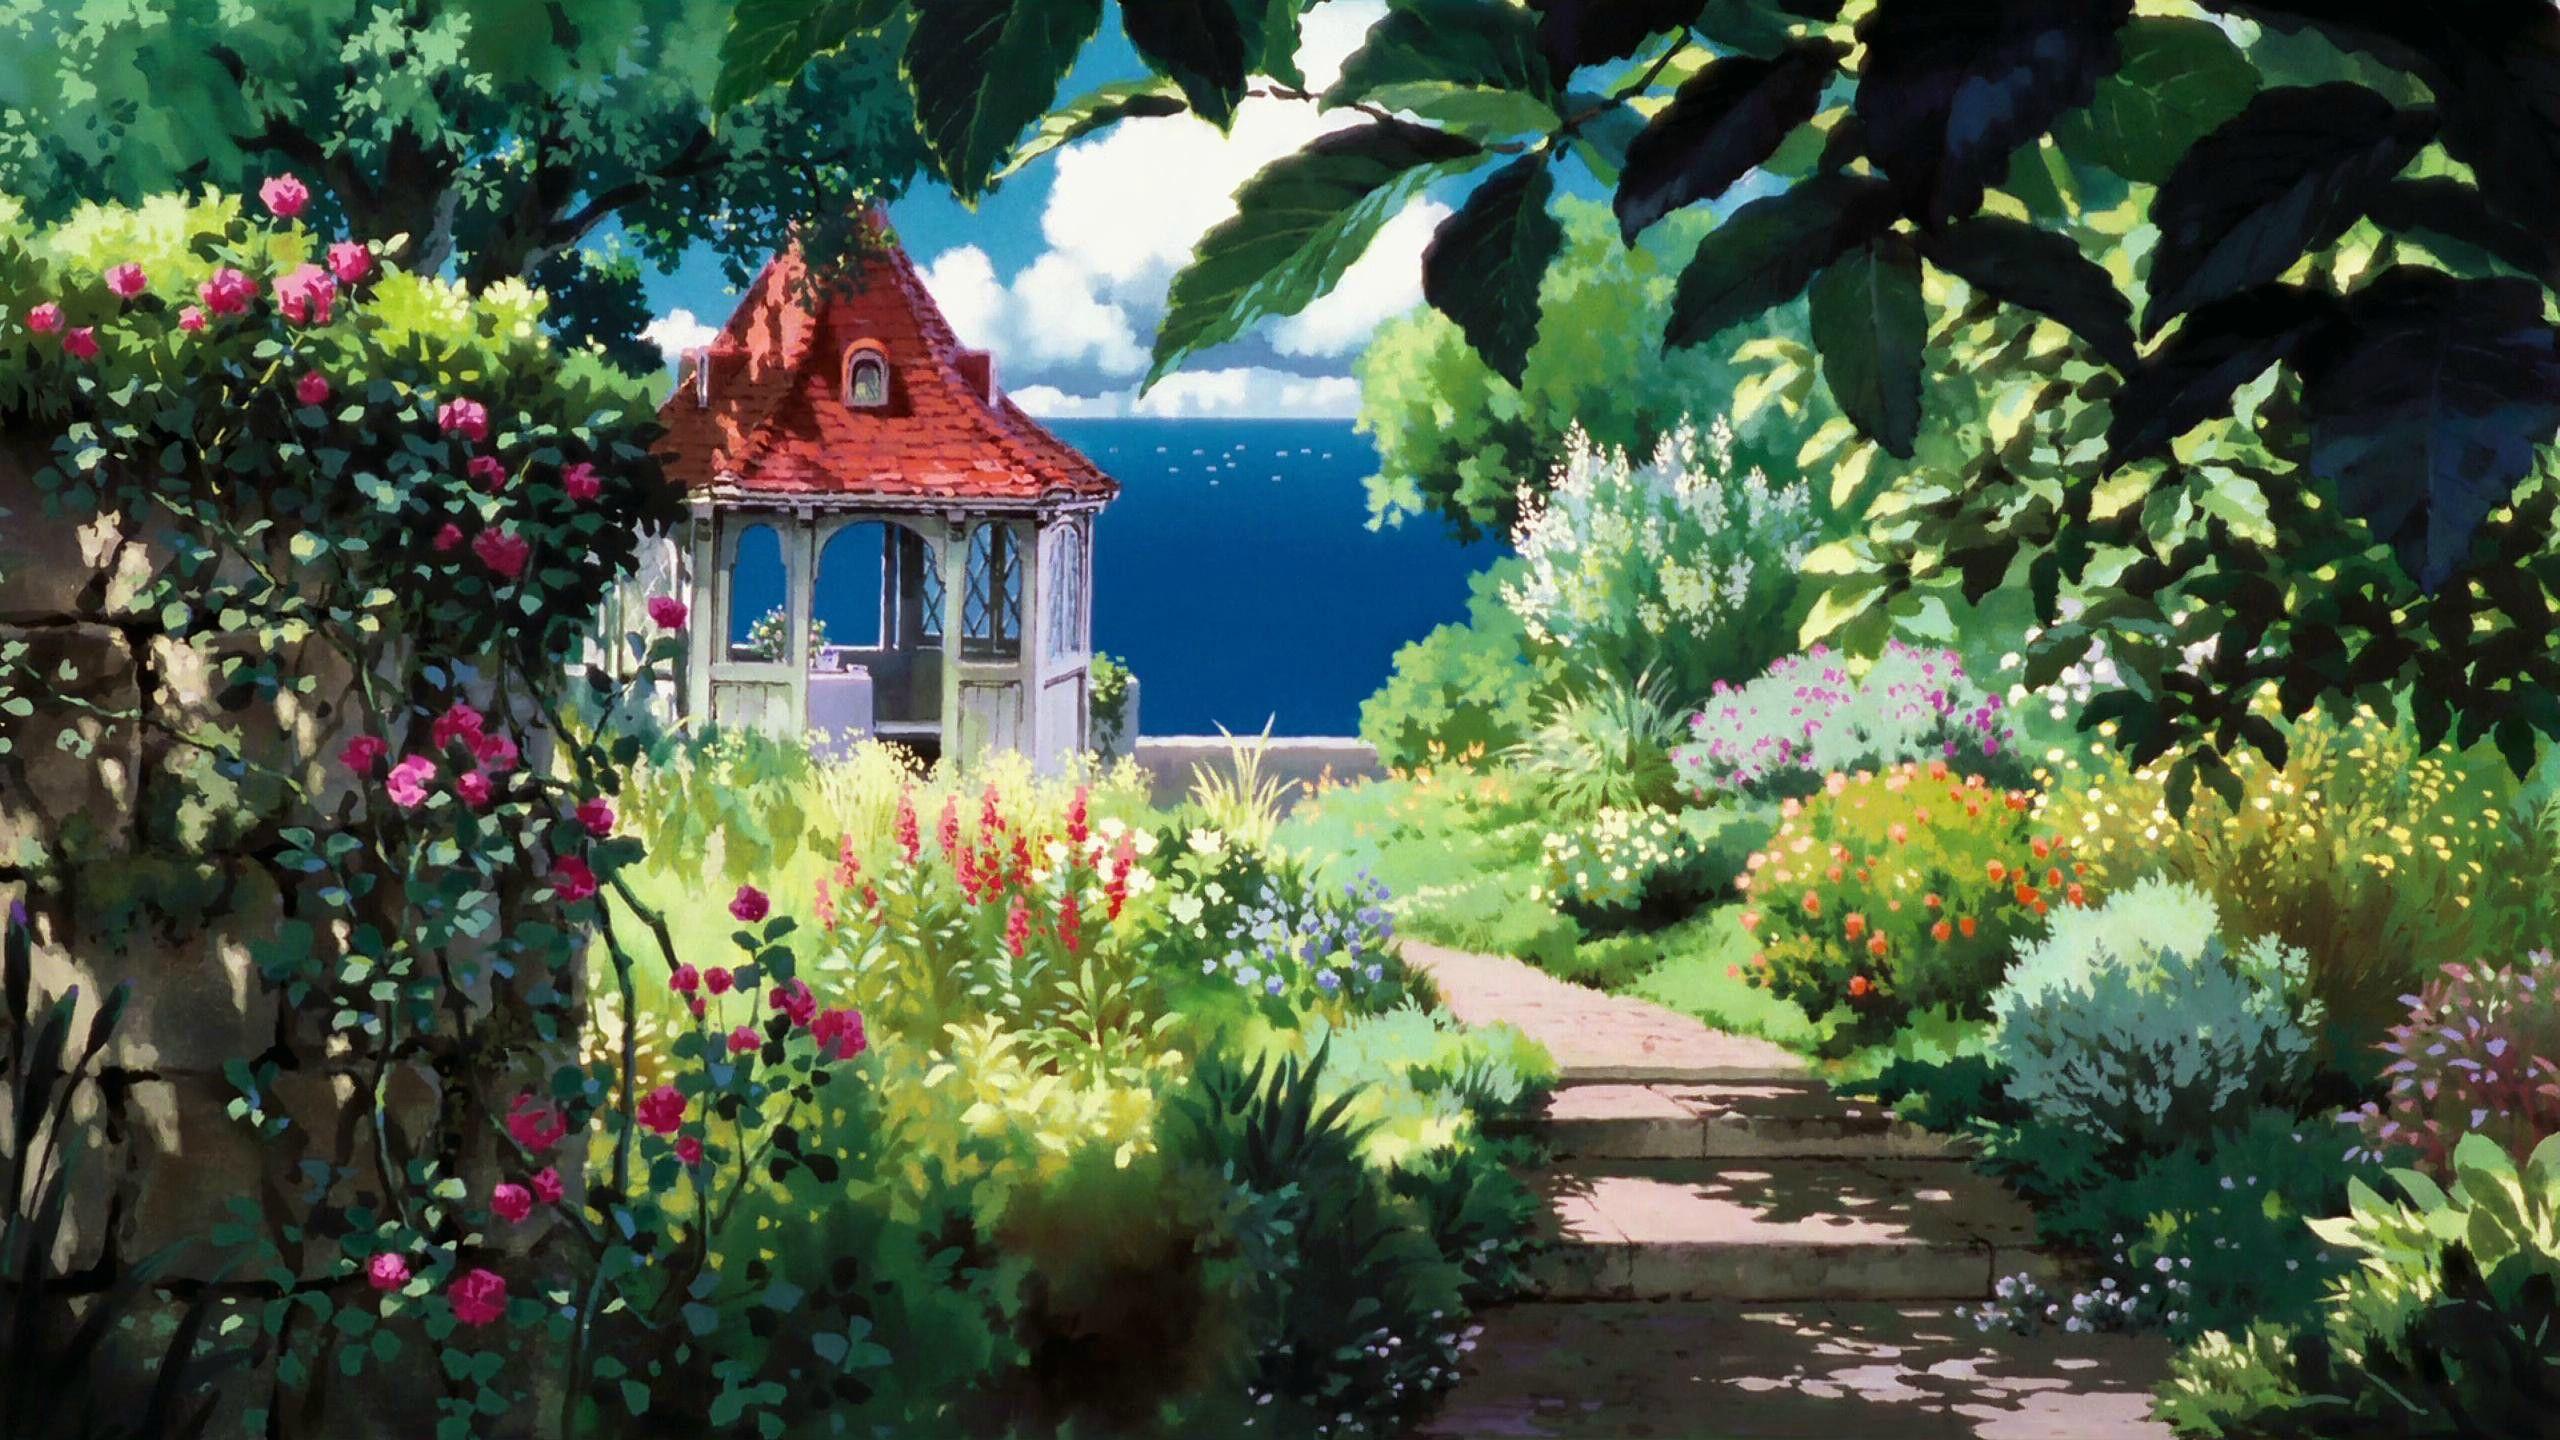 Studio Ghibli Backgrounds In 2019 Anime & Game Scenery